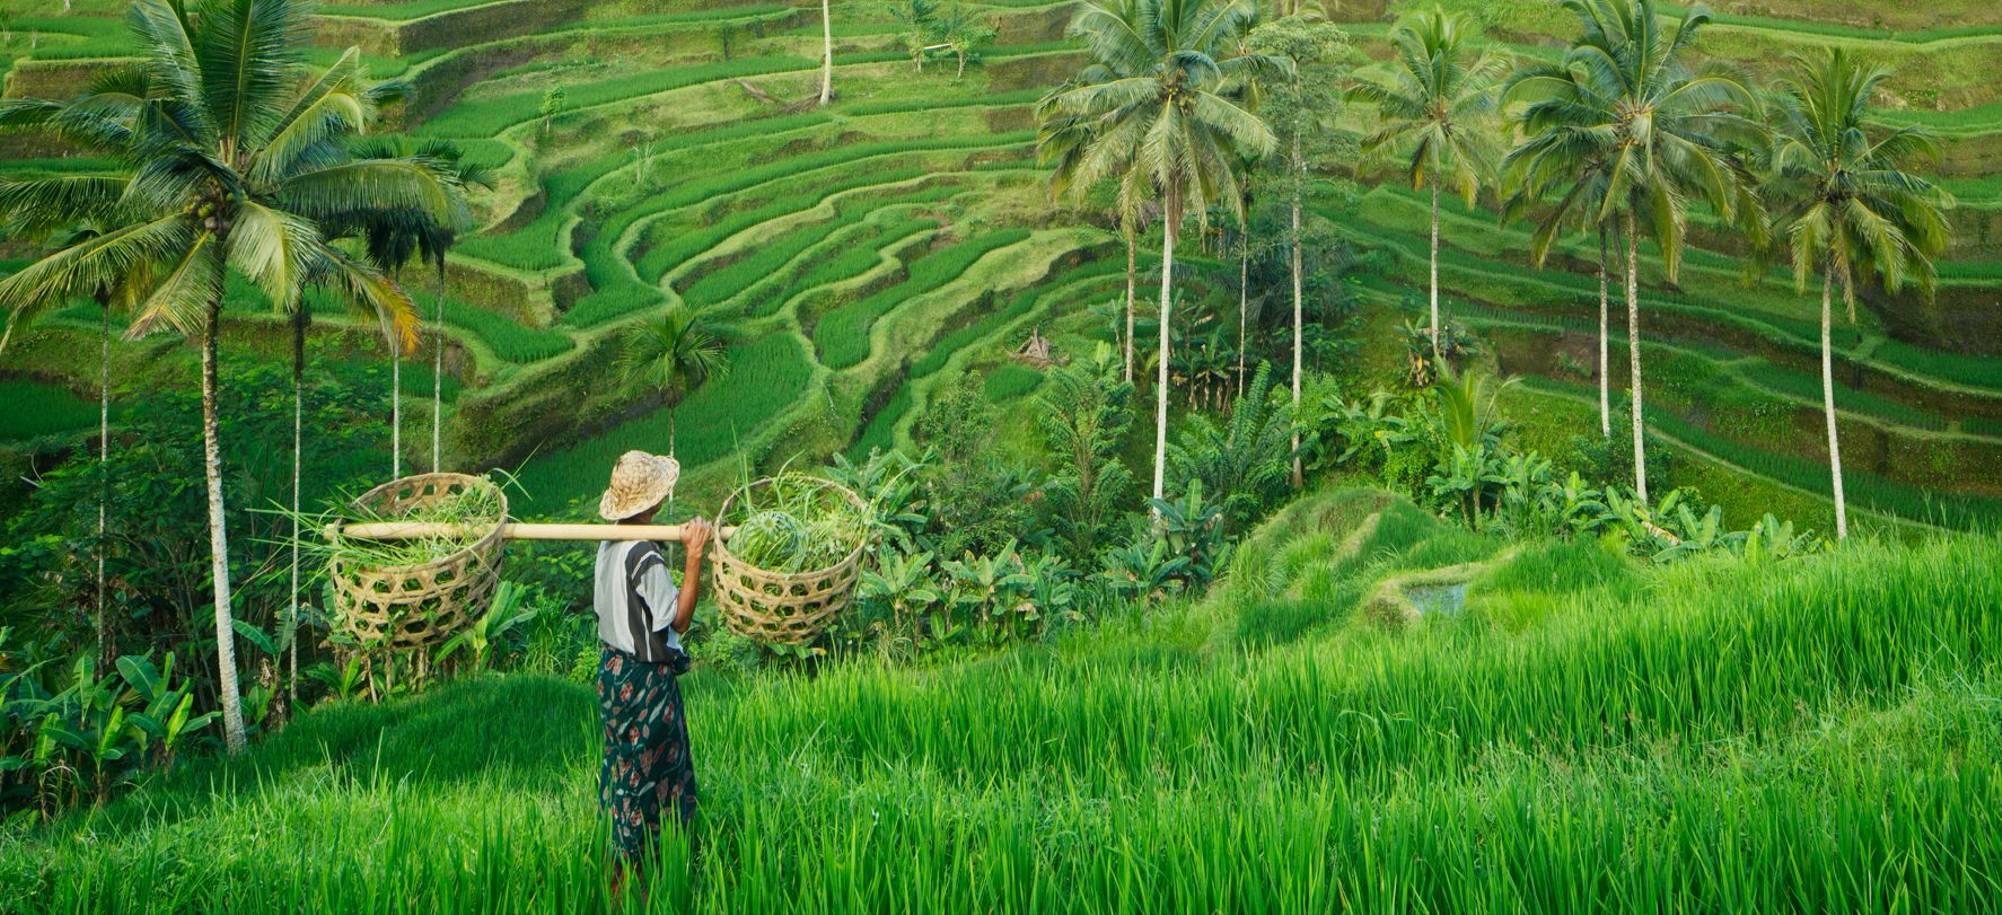 Bali   Ubud Rice Fields   Itinerary Desktop